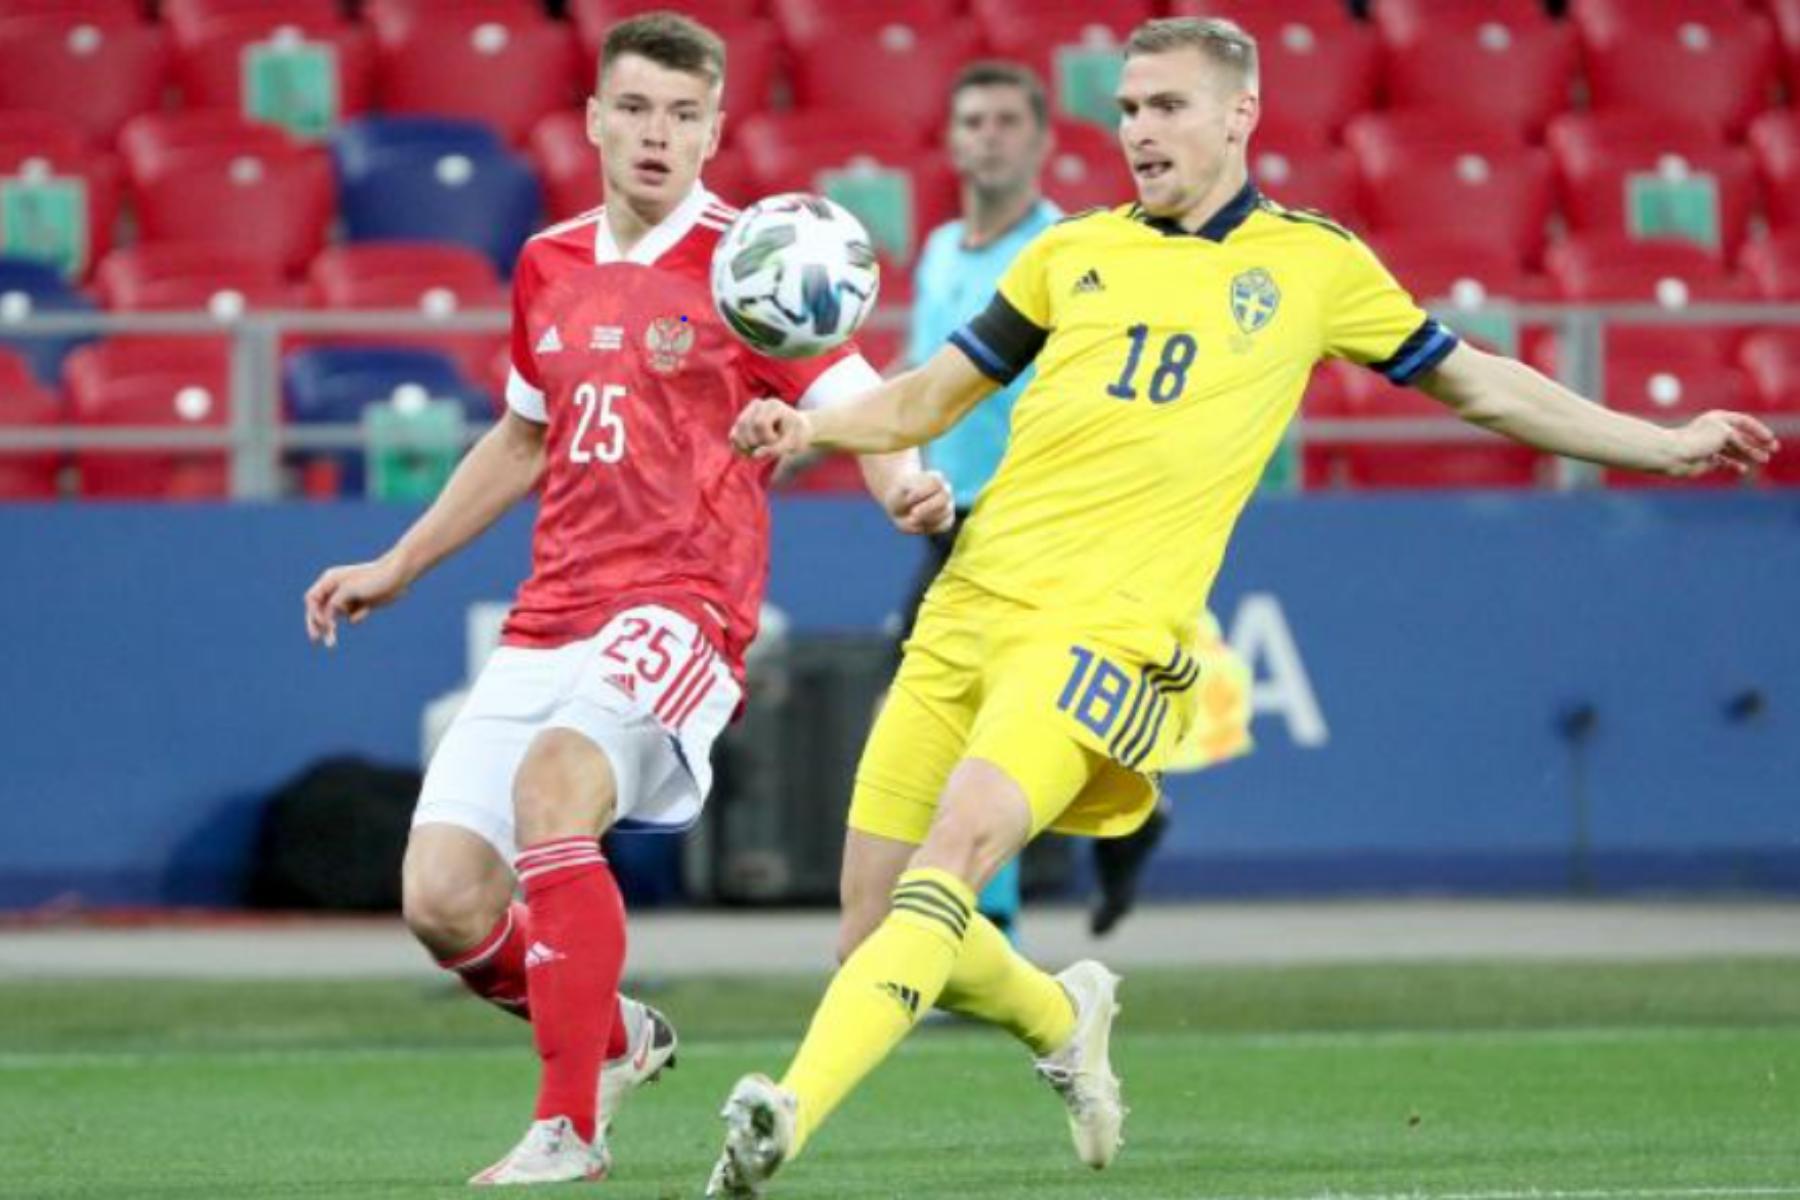 Celtic 'in talks' with Rubin Kazan over £4m defender Carl Starfelt